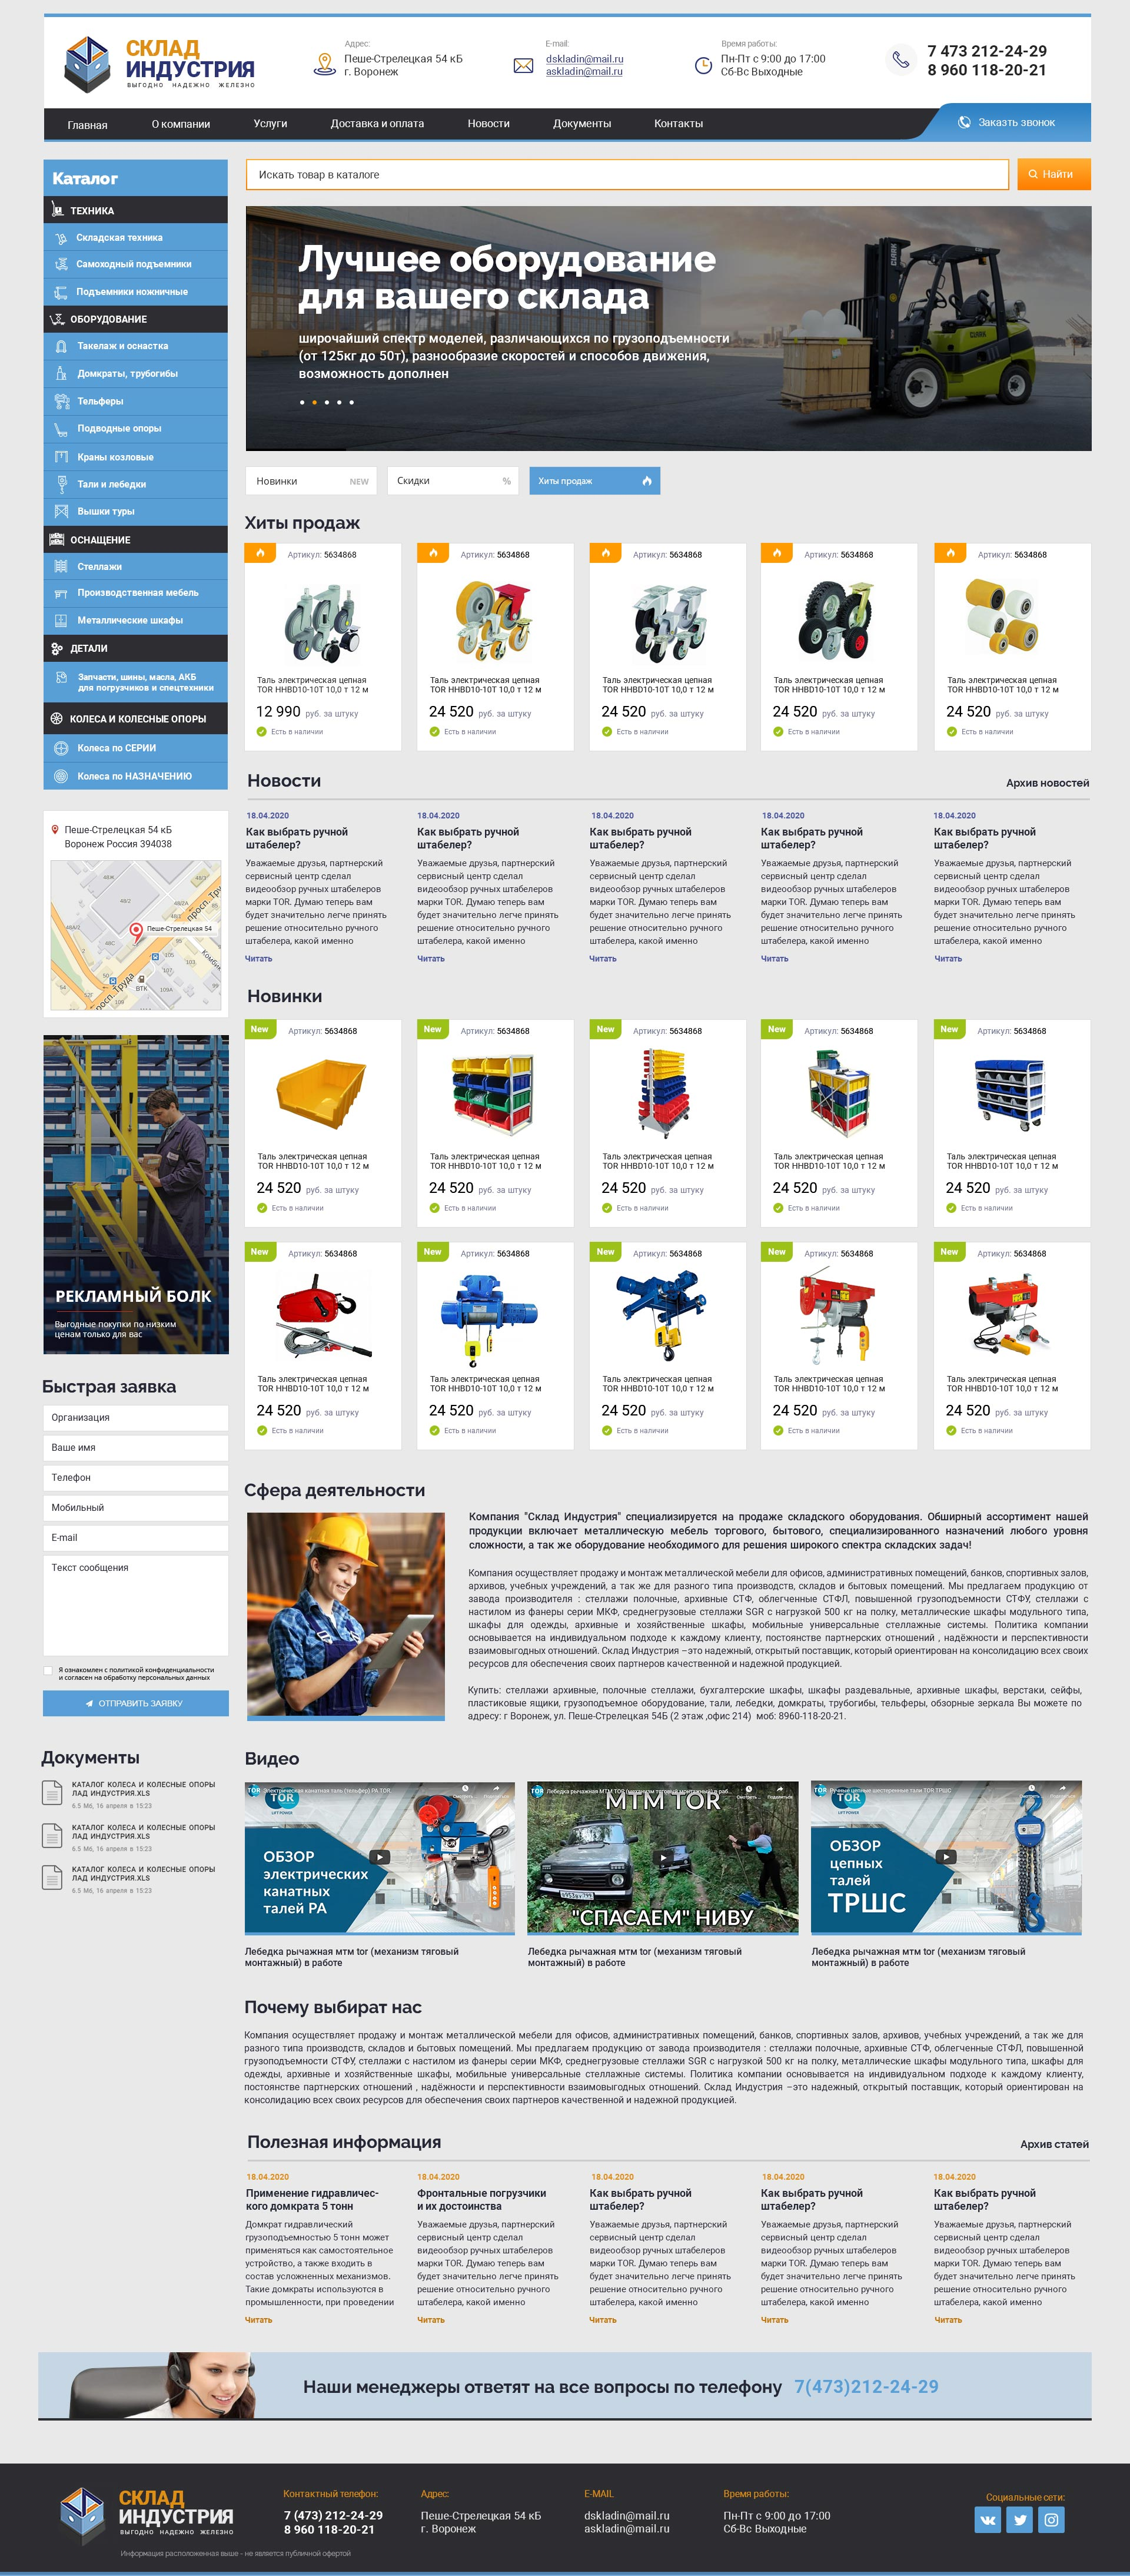 сайт торговля пример Склад индустрия 1920 px